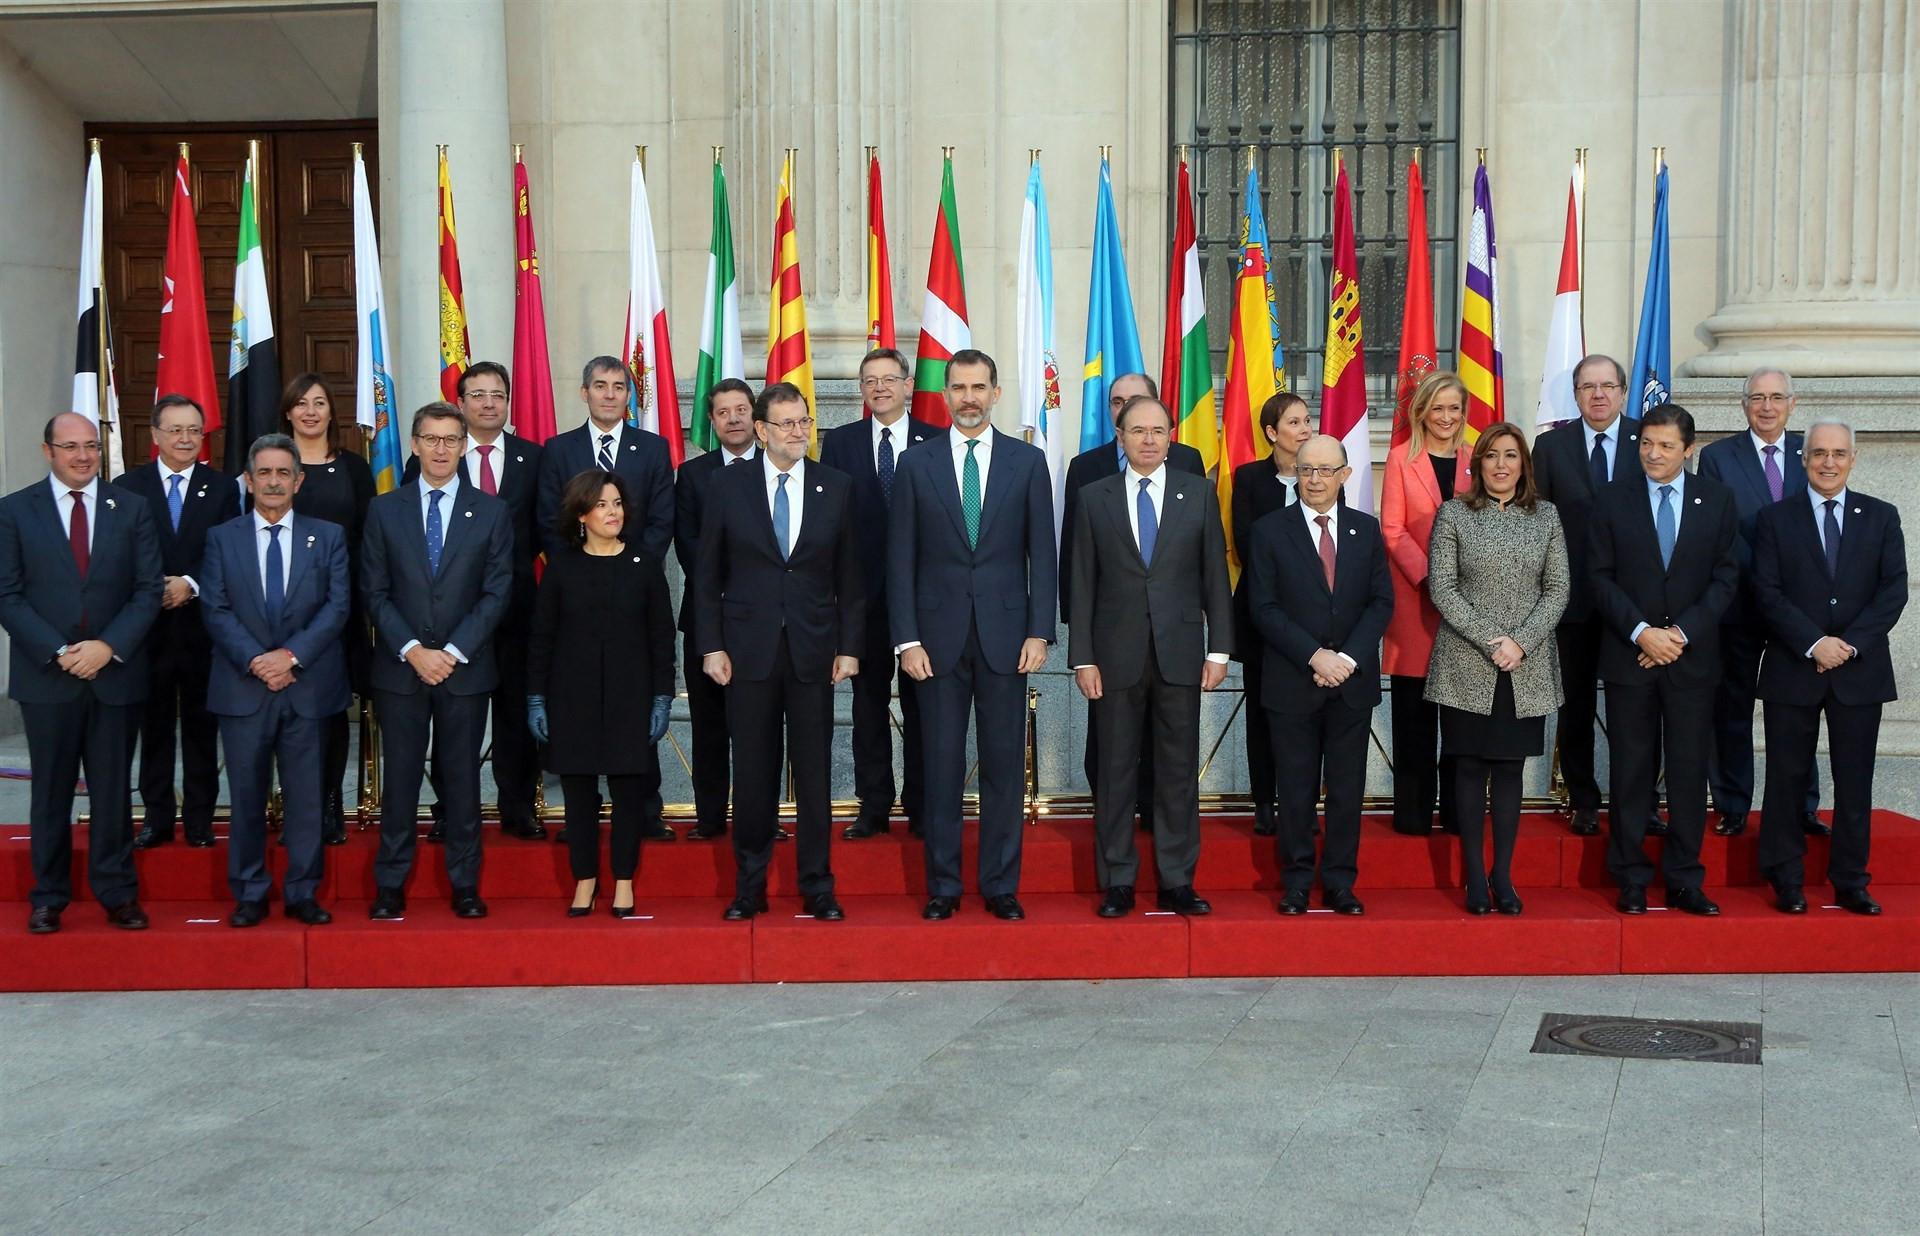 Fotofamiliaconferenciadepresidentes